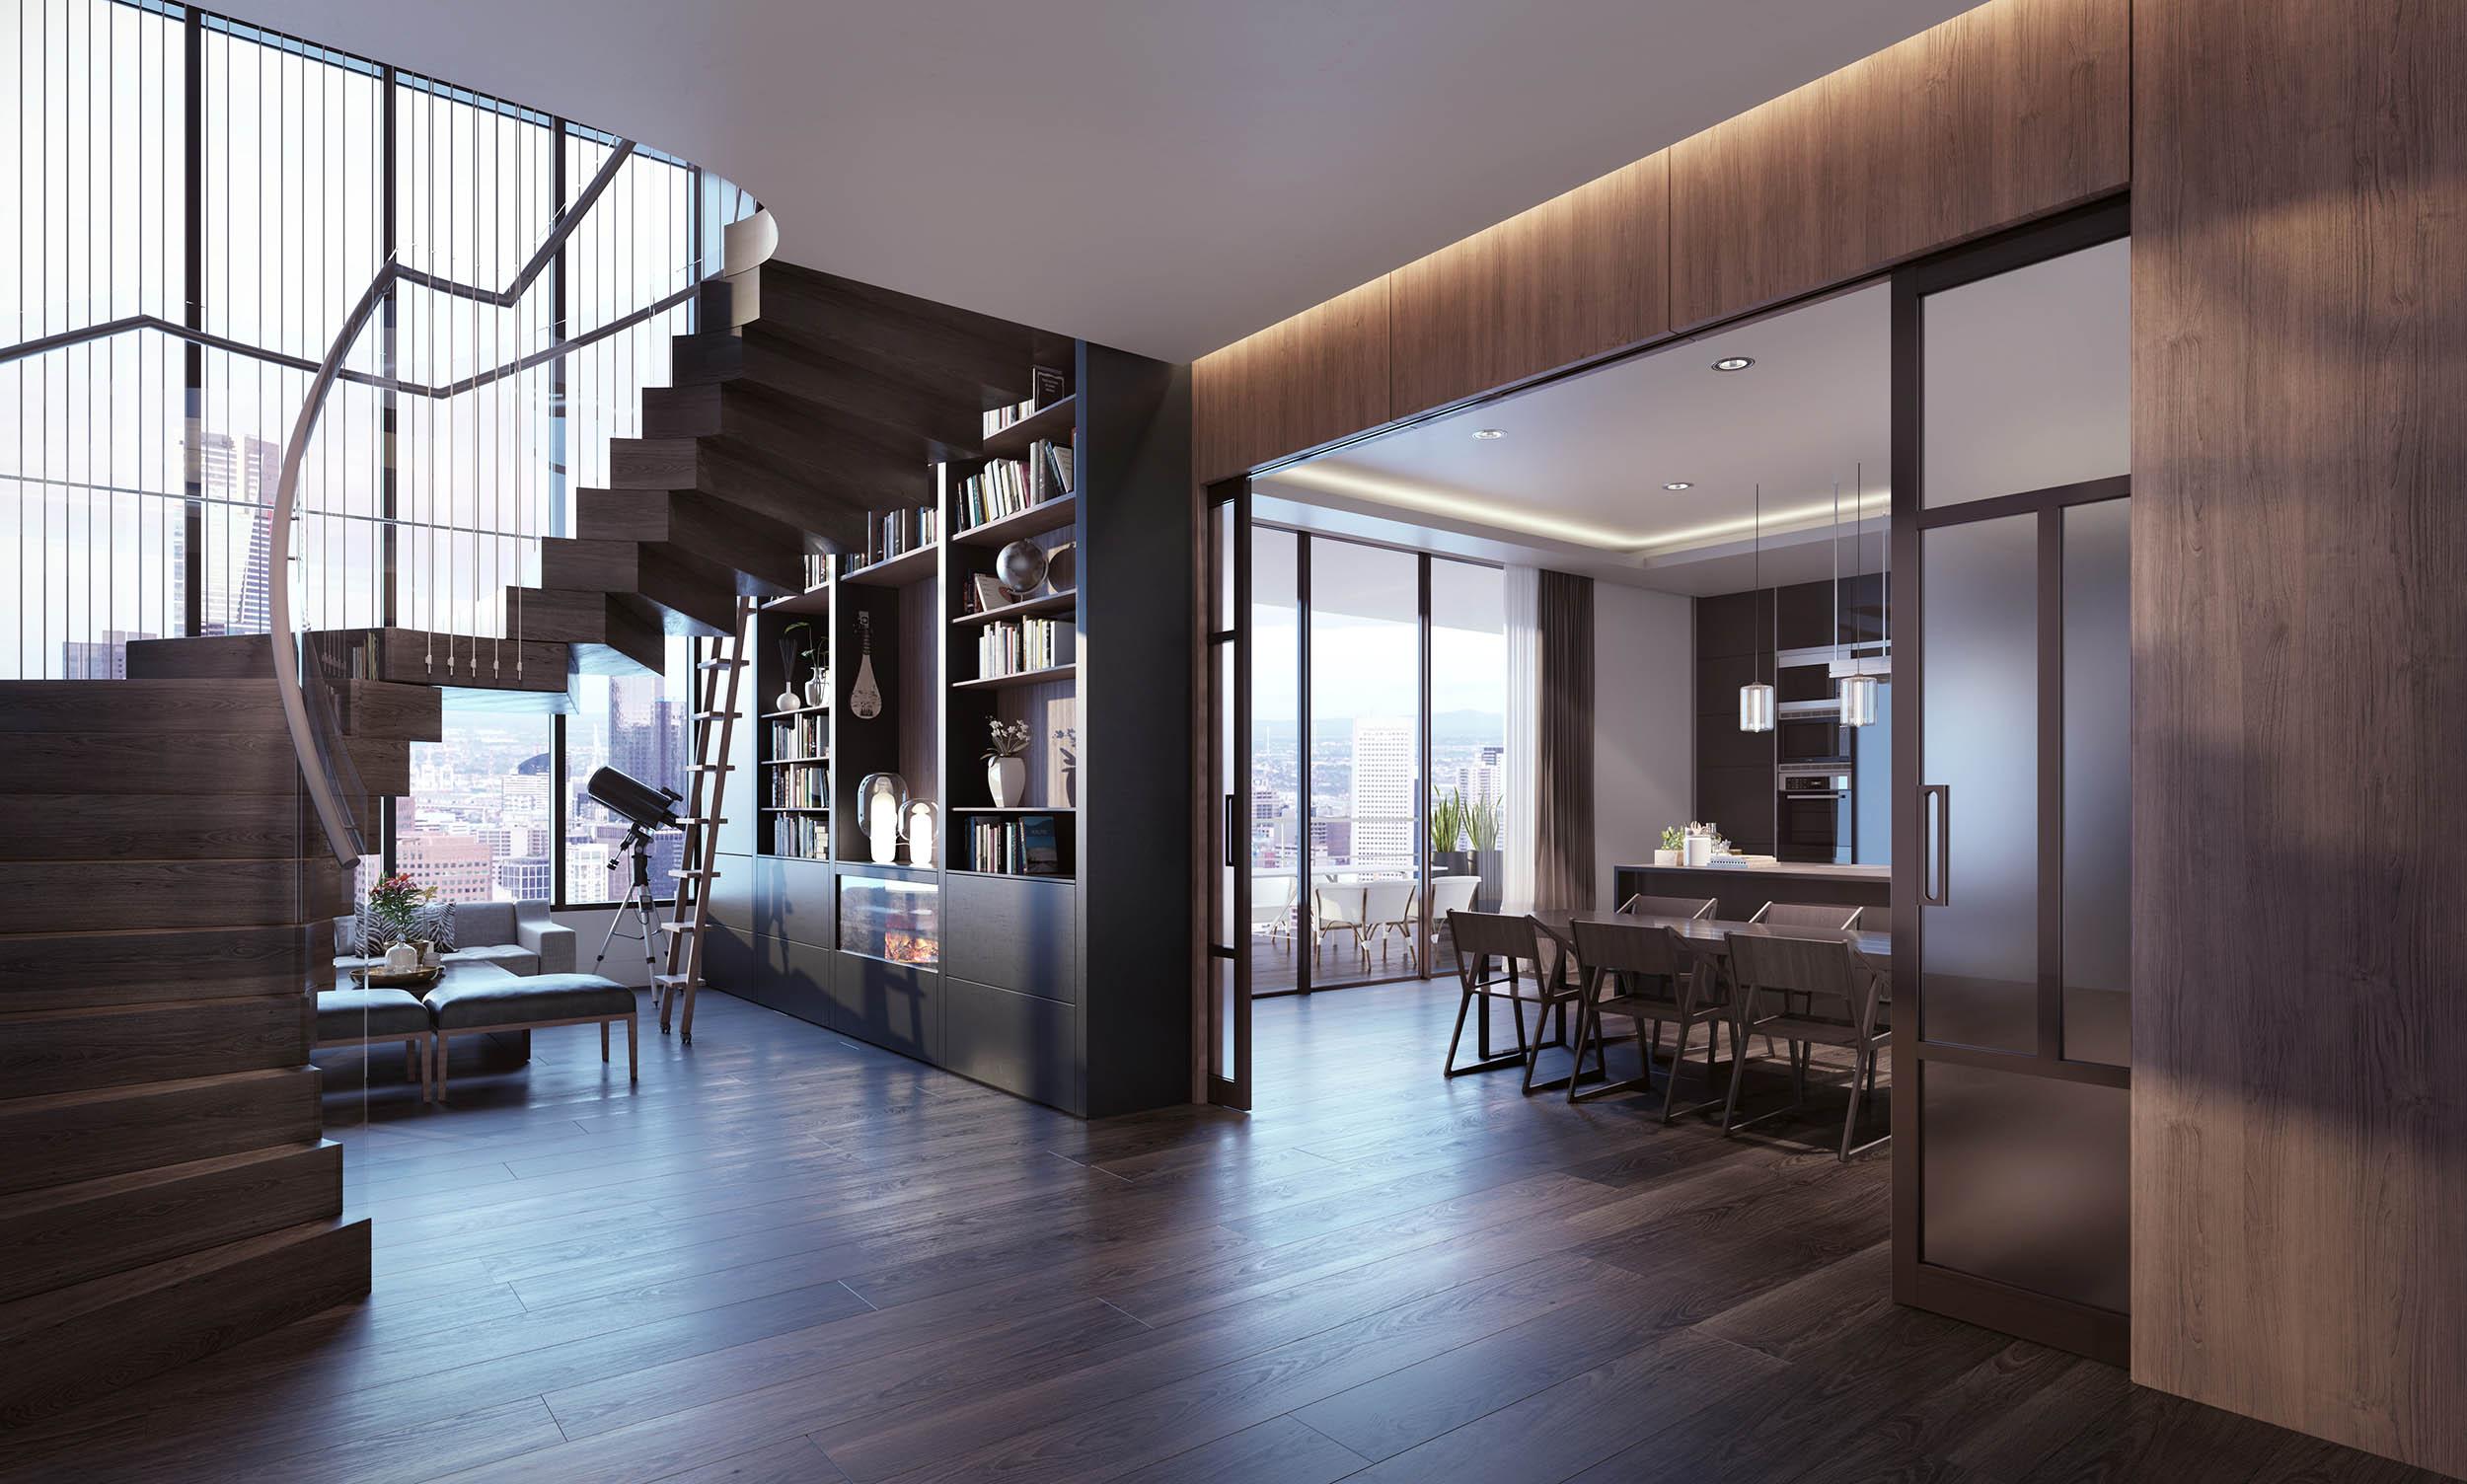 3d+rendering+melbourne+luxury+apartment+premium+visualisation+city+view